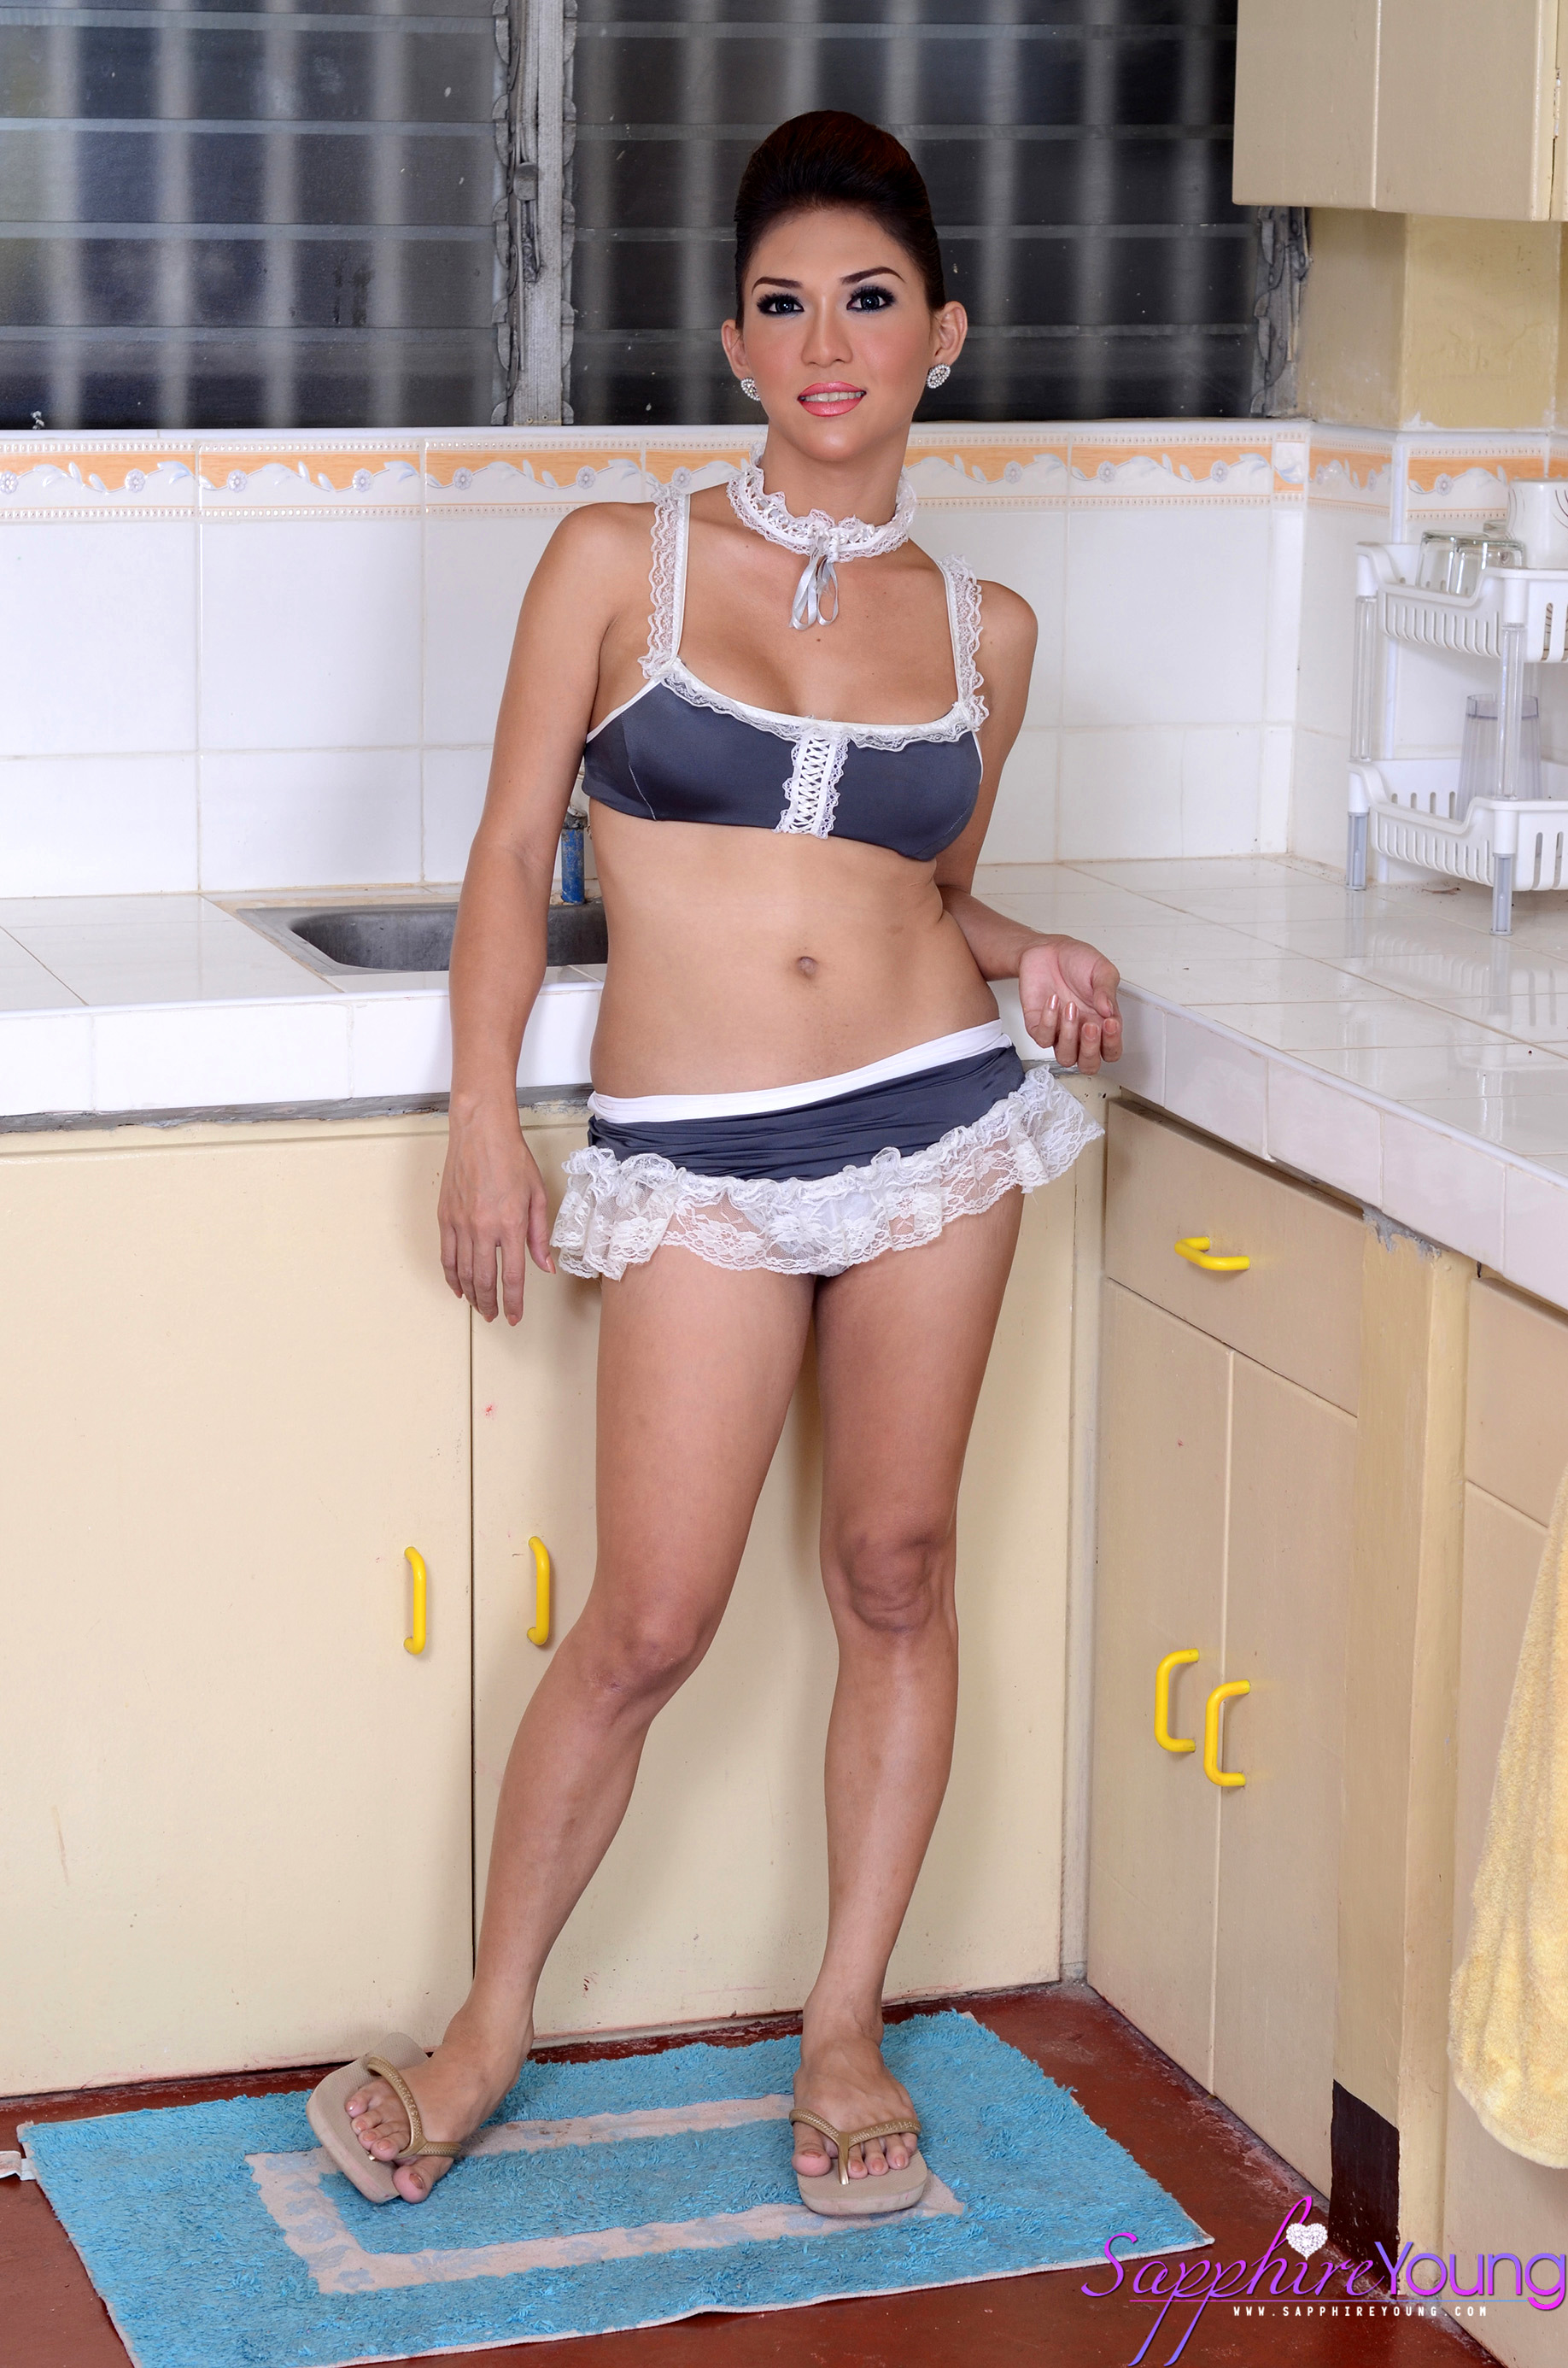 Very Feminine Thai Ladyboy With Massive Boobs Masturbates In The